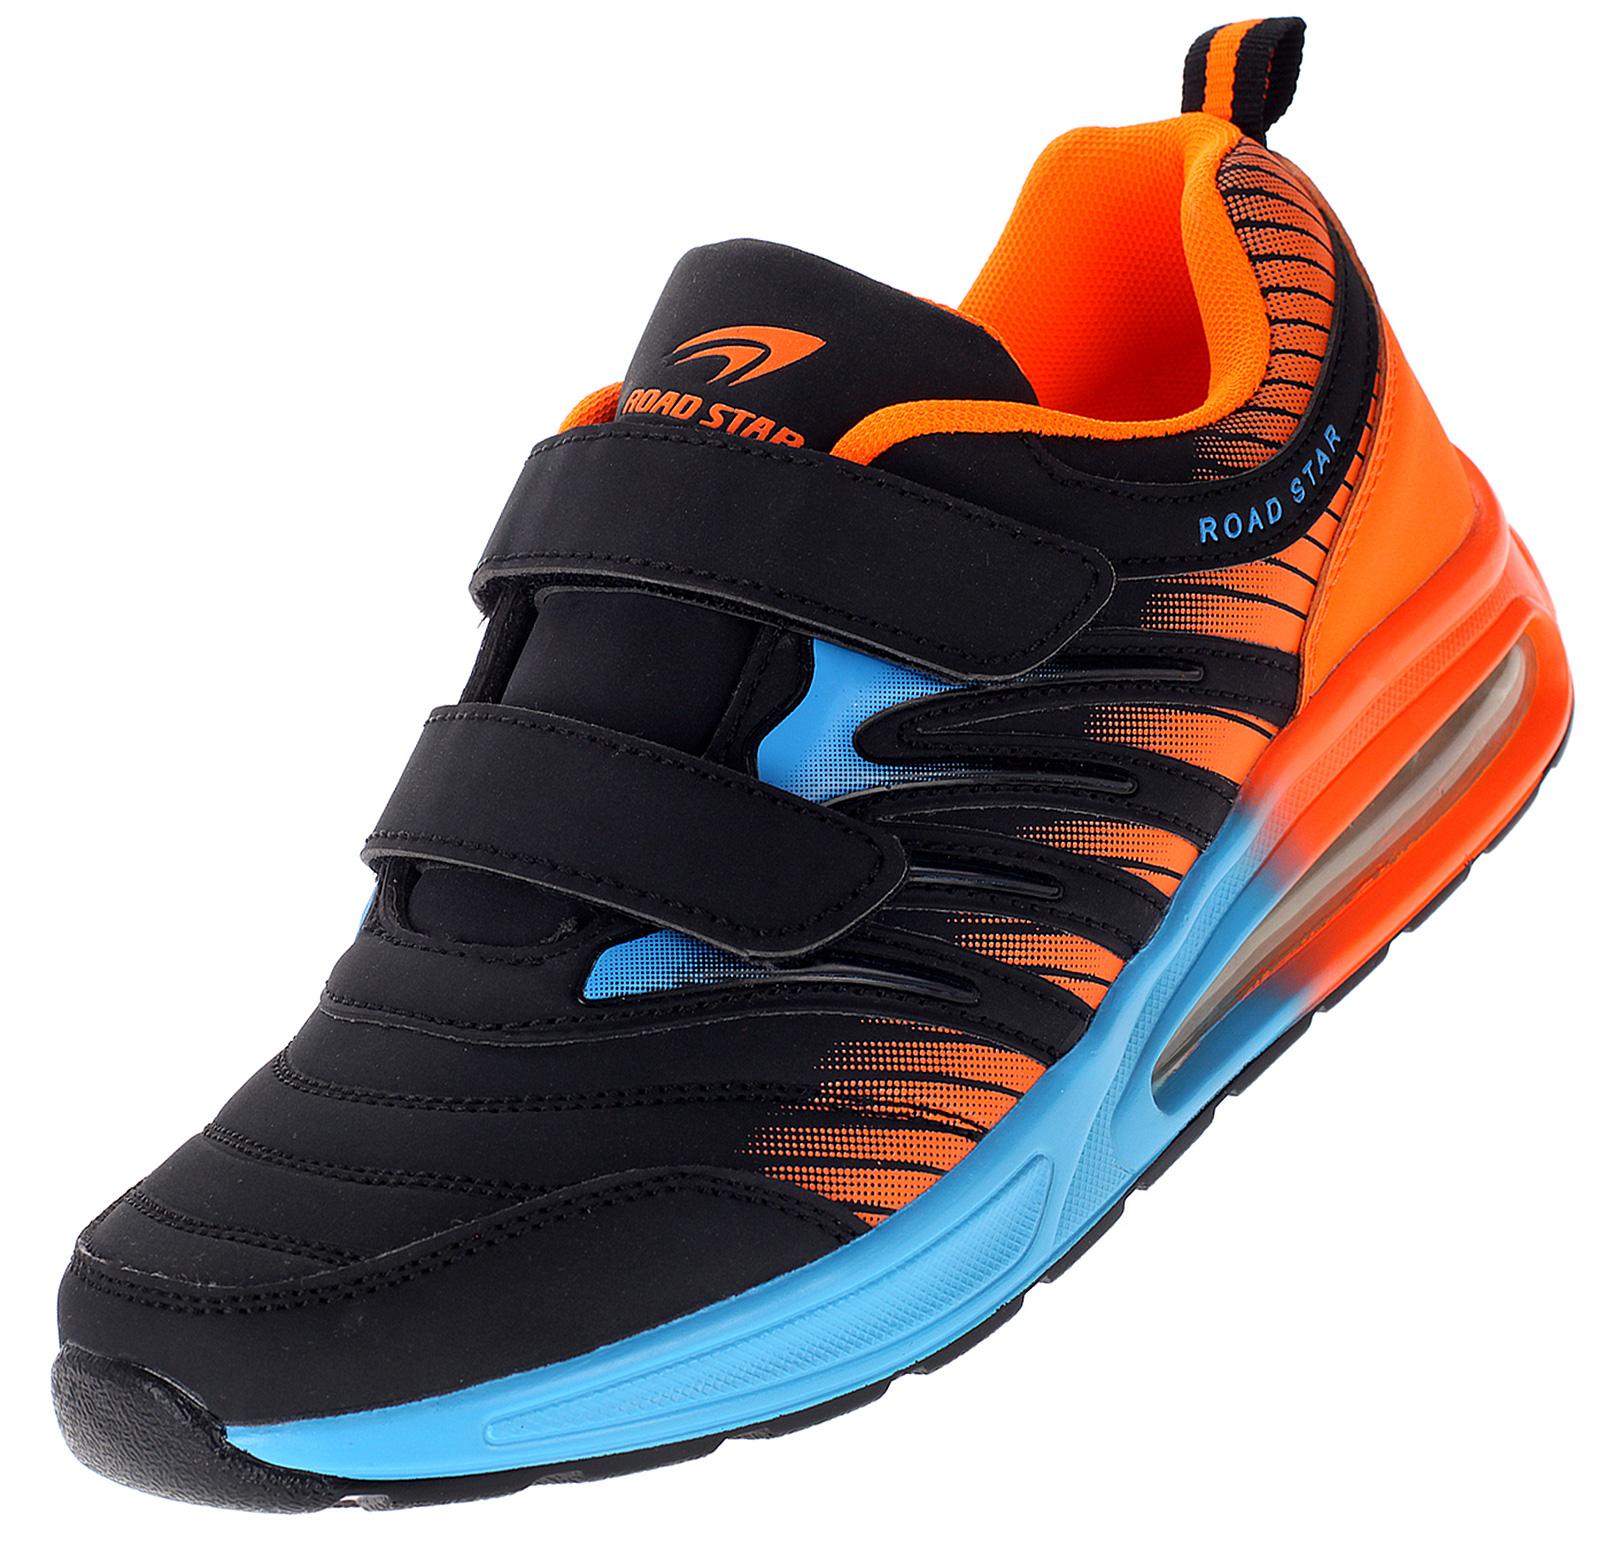 5. Schwarz-Orange-Blau